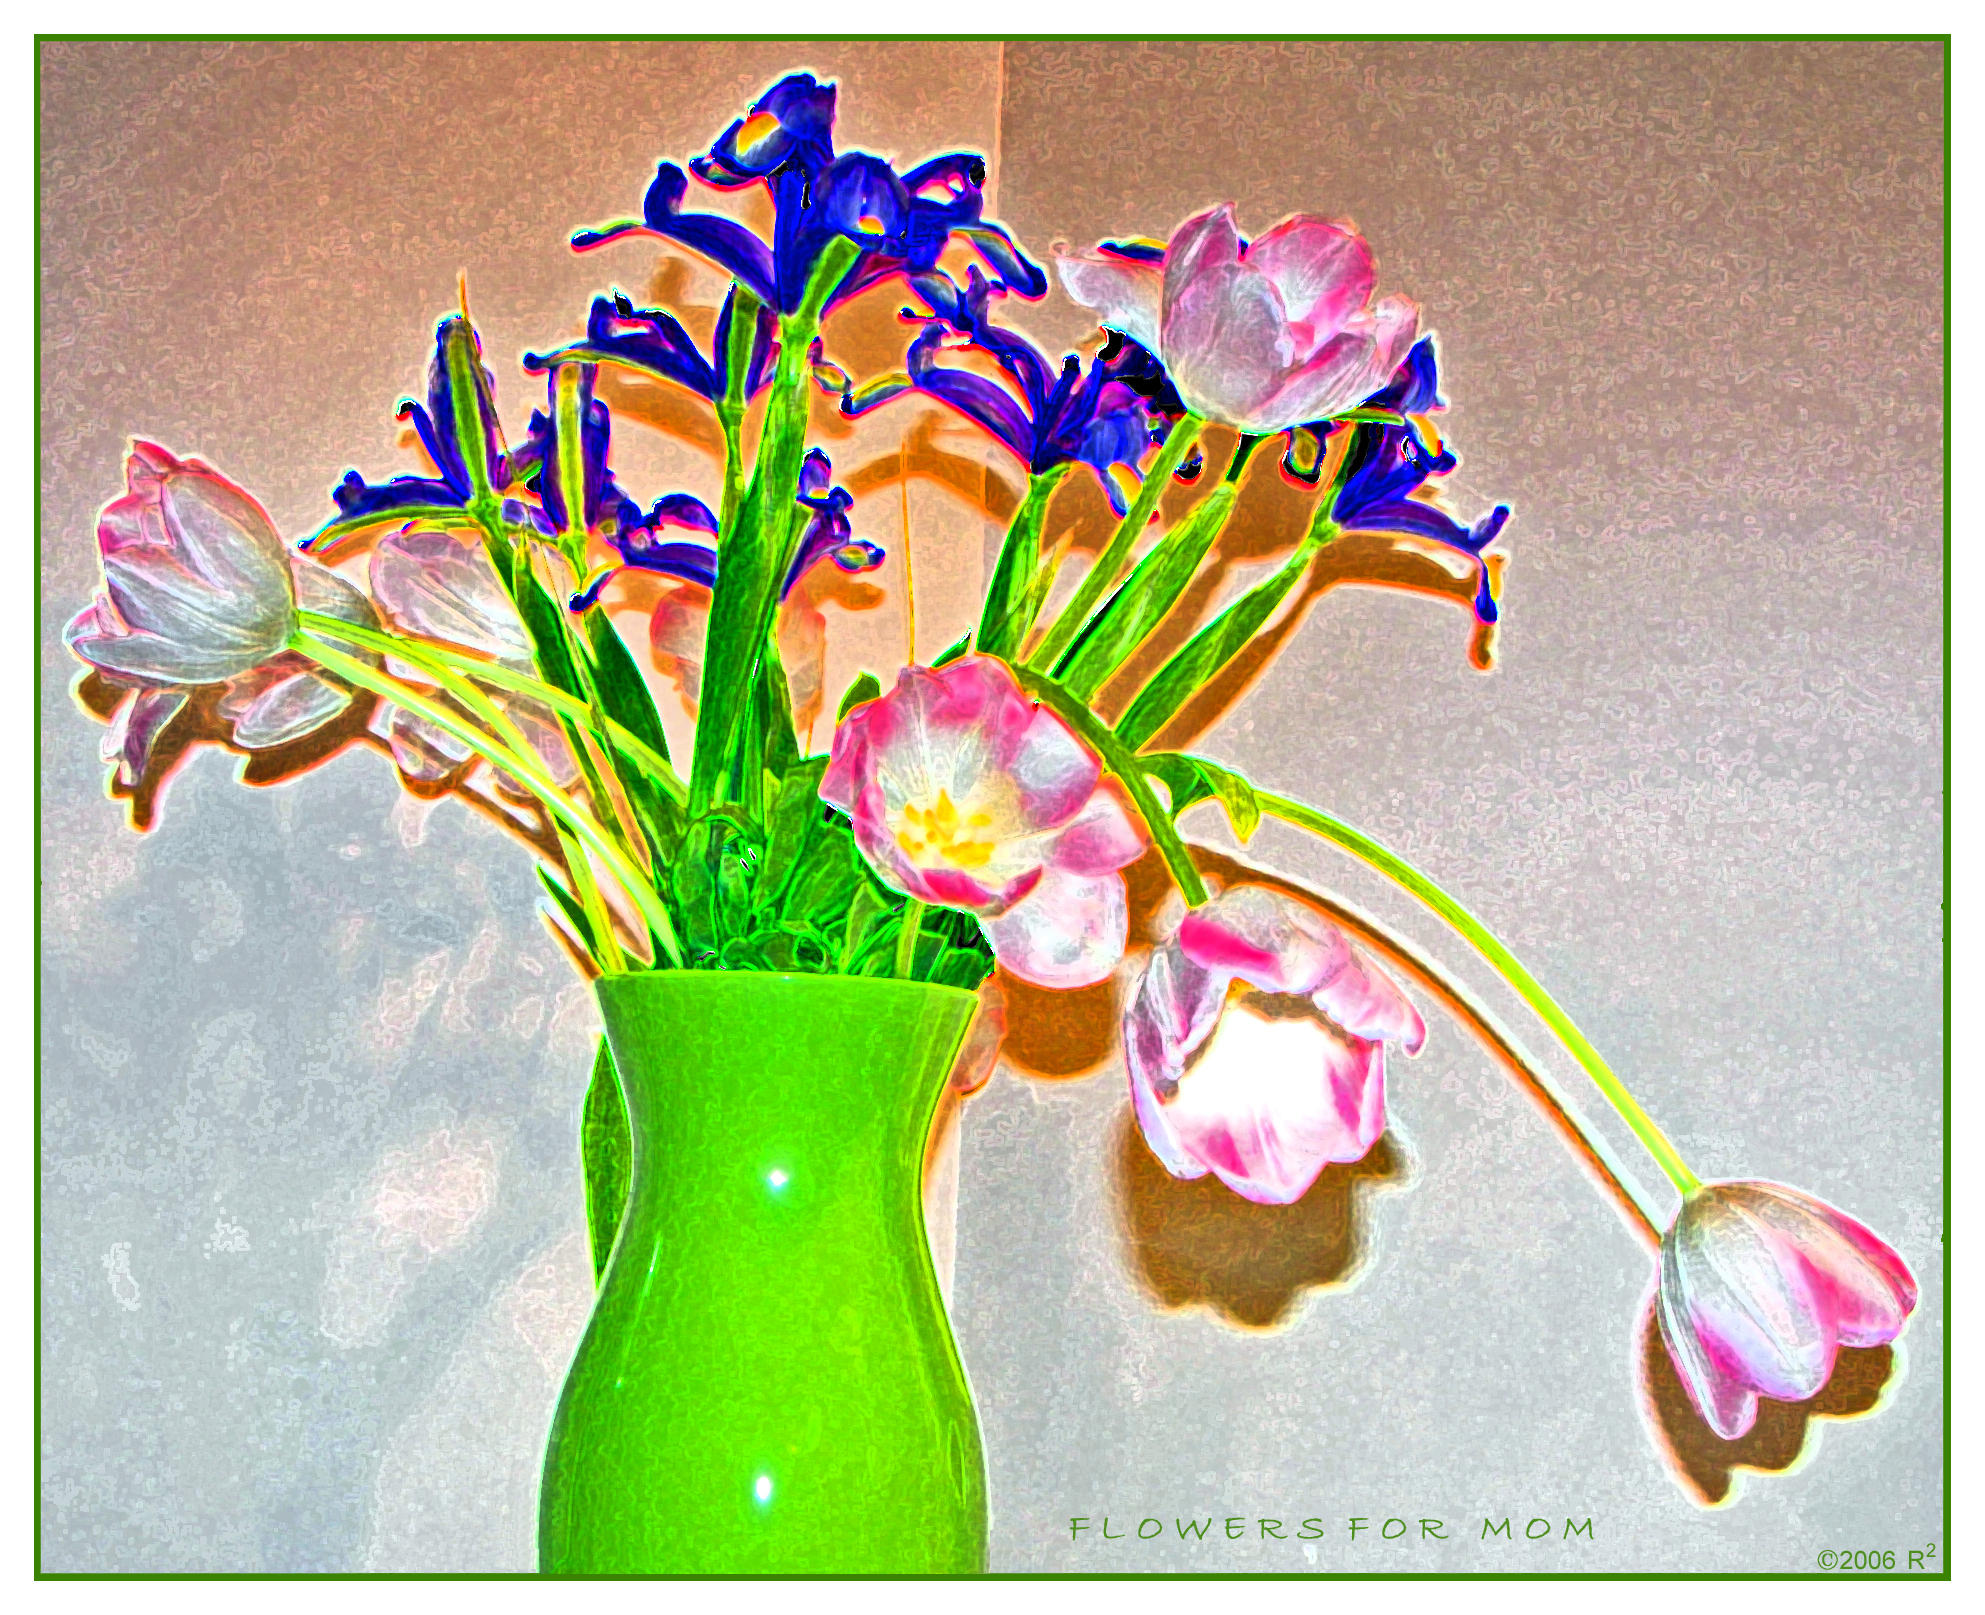 Flowers for Mom by beatlefreak on DeviantArt